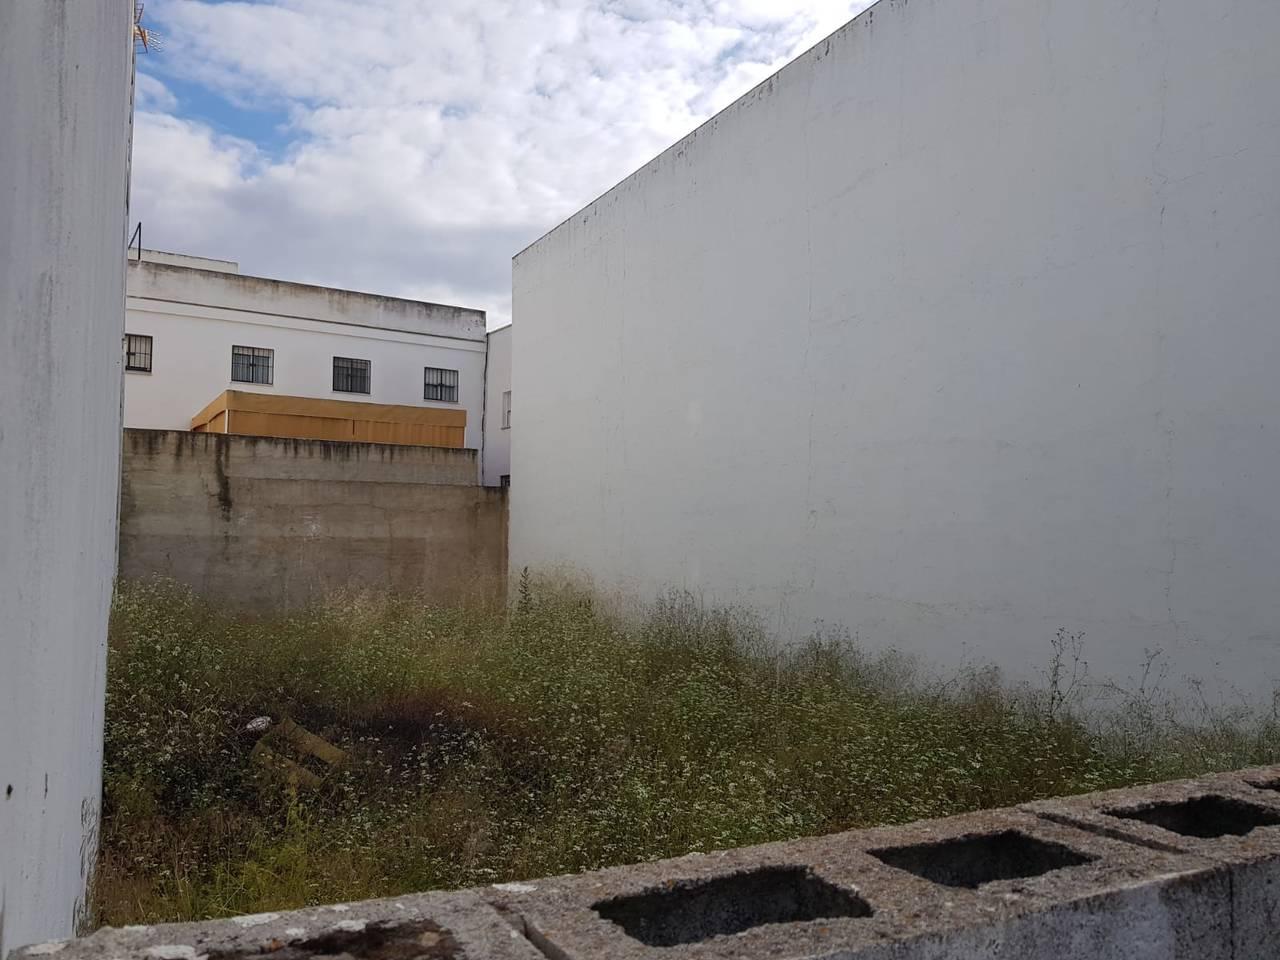 Venta solar en Huelva.  - Foto 5